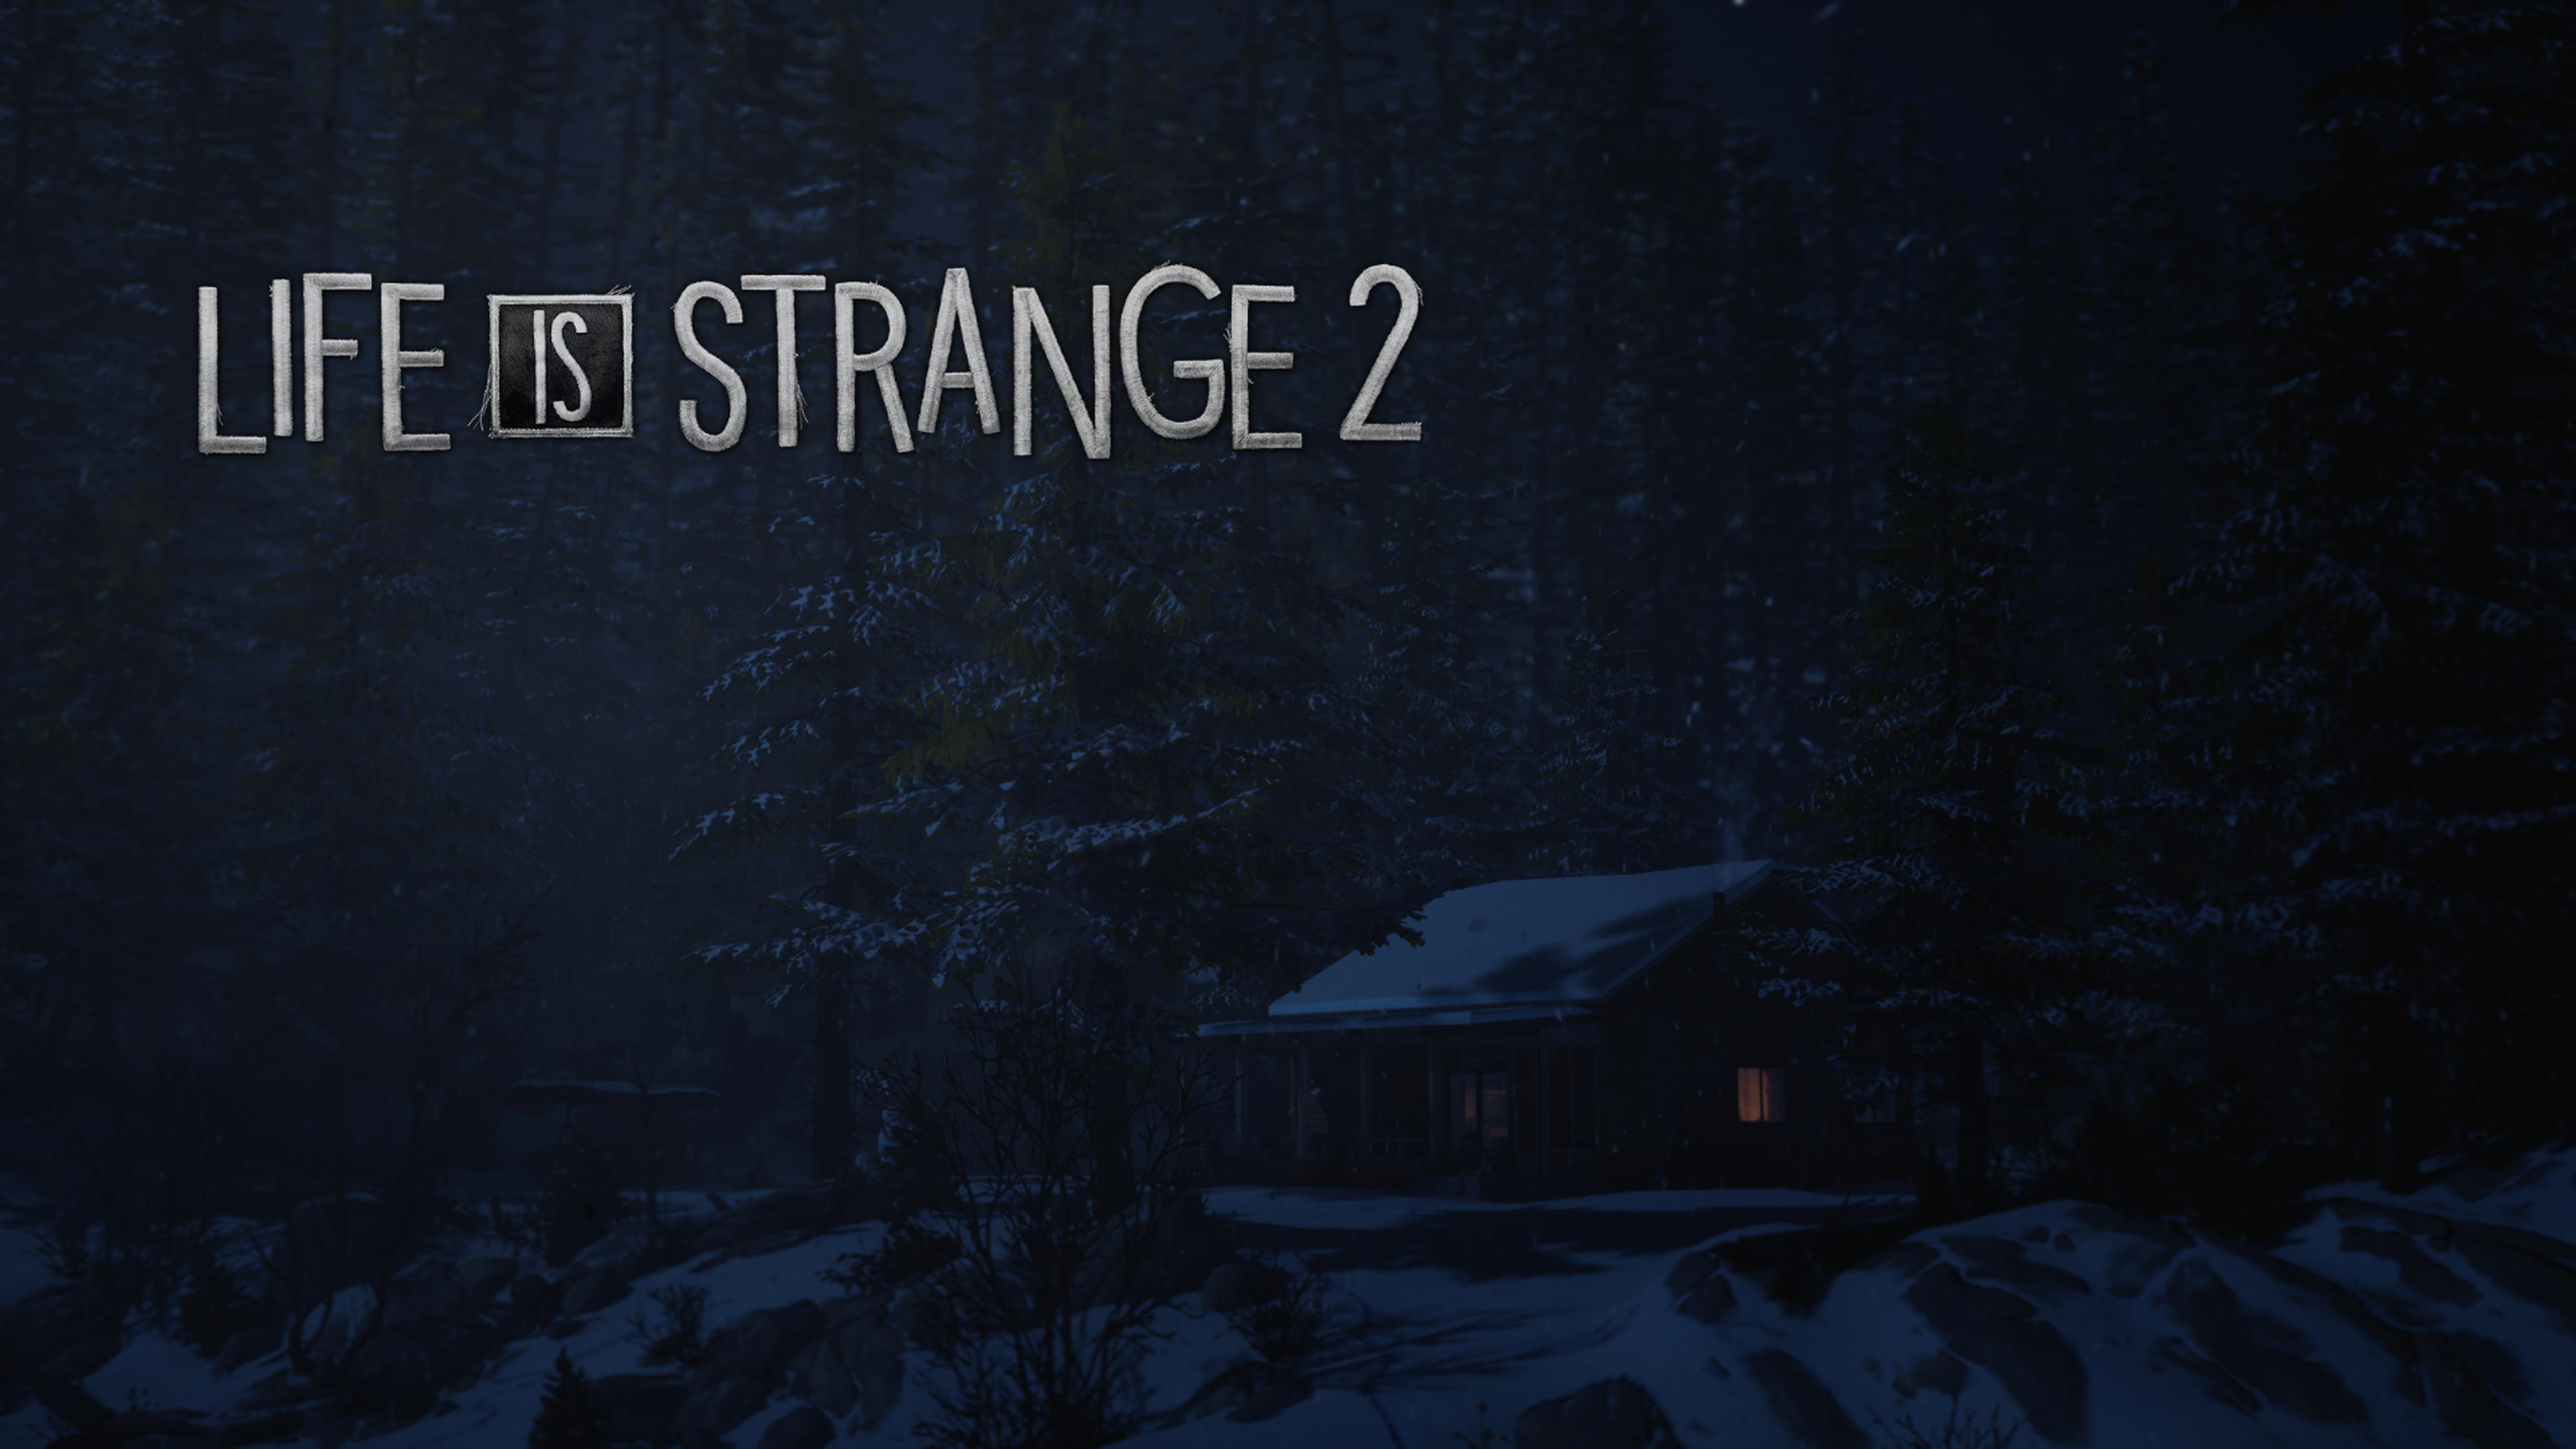 Life is Strange – Episode 2